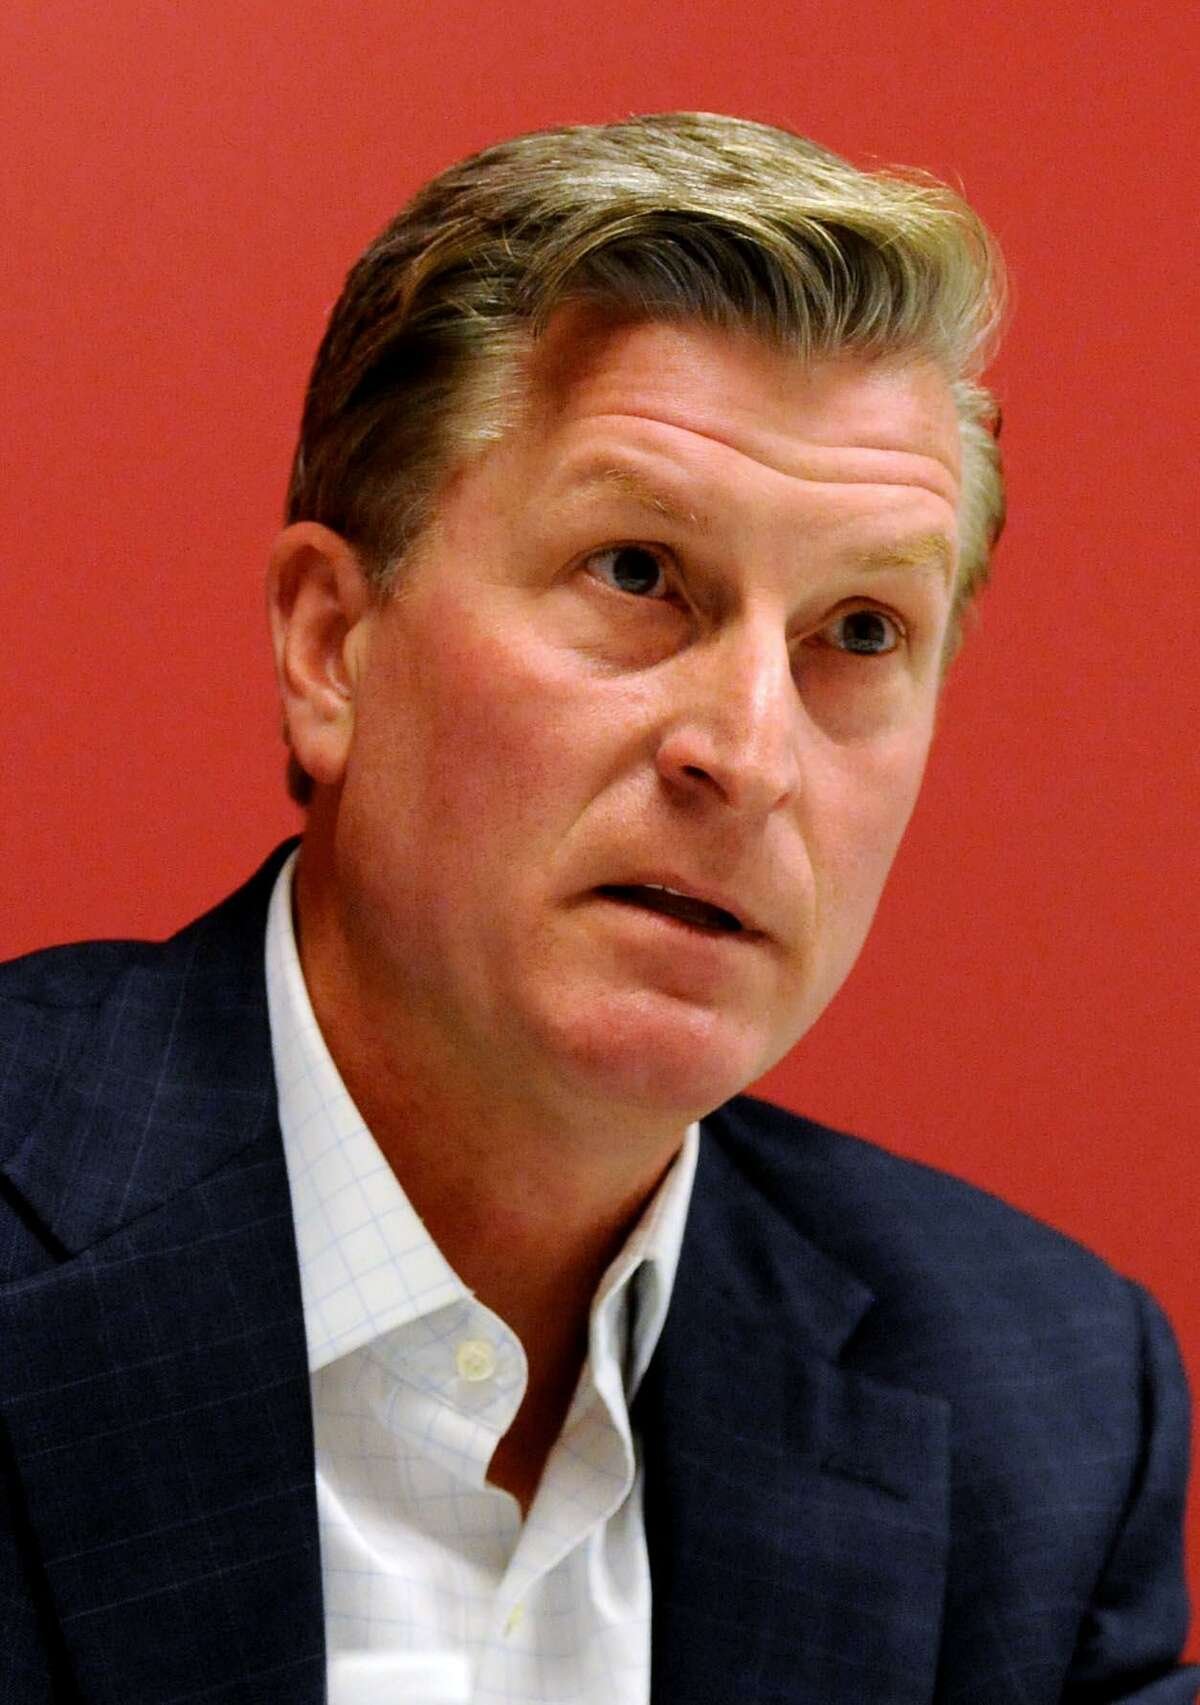 Steve Obsitnik, a Republican candidate for governor.